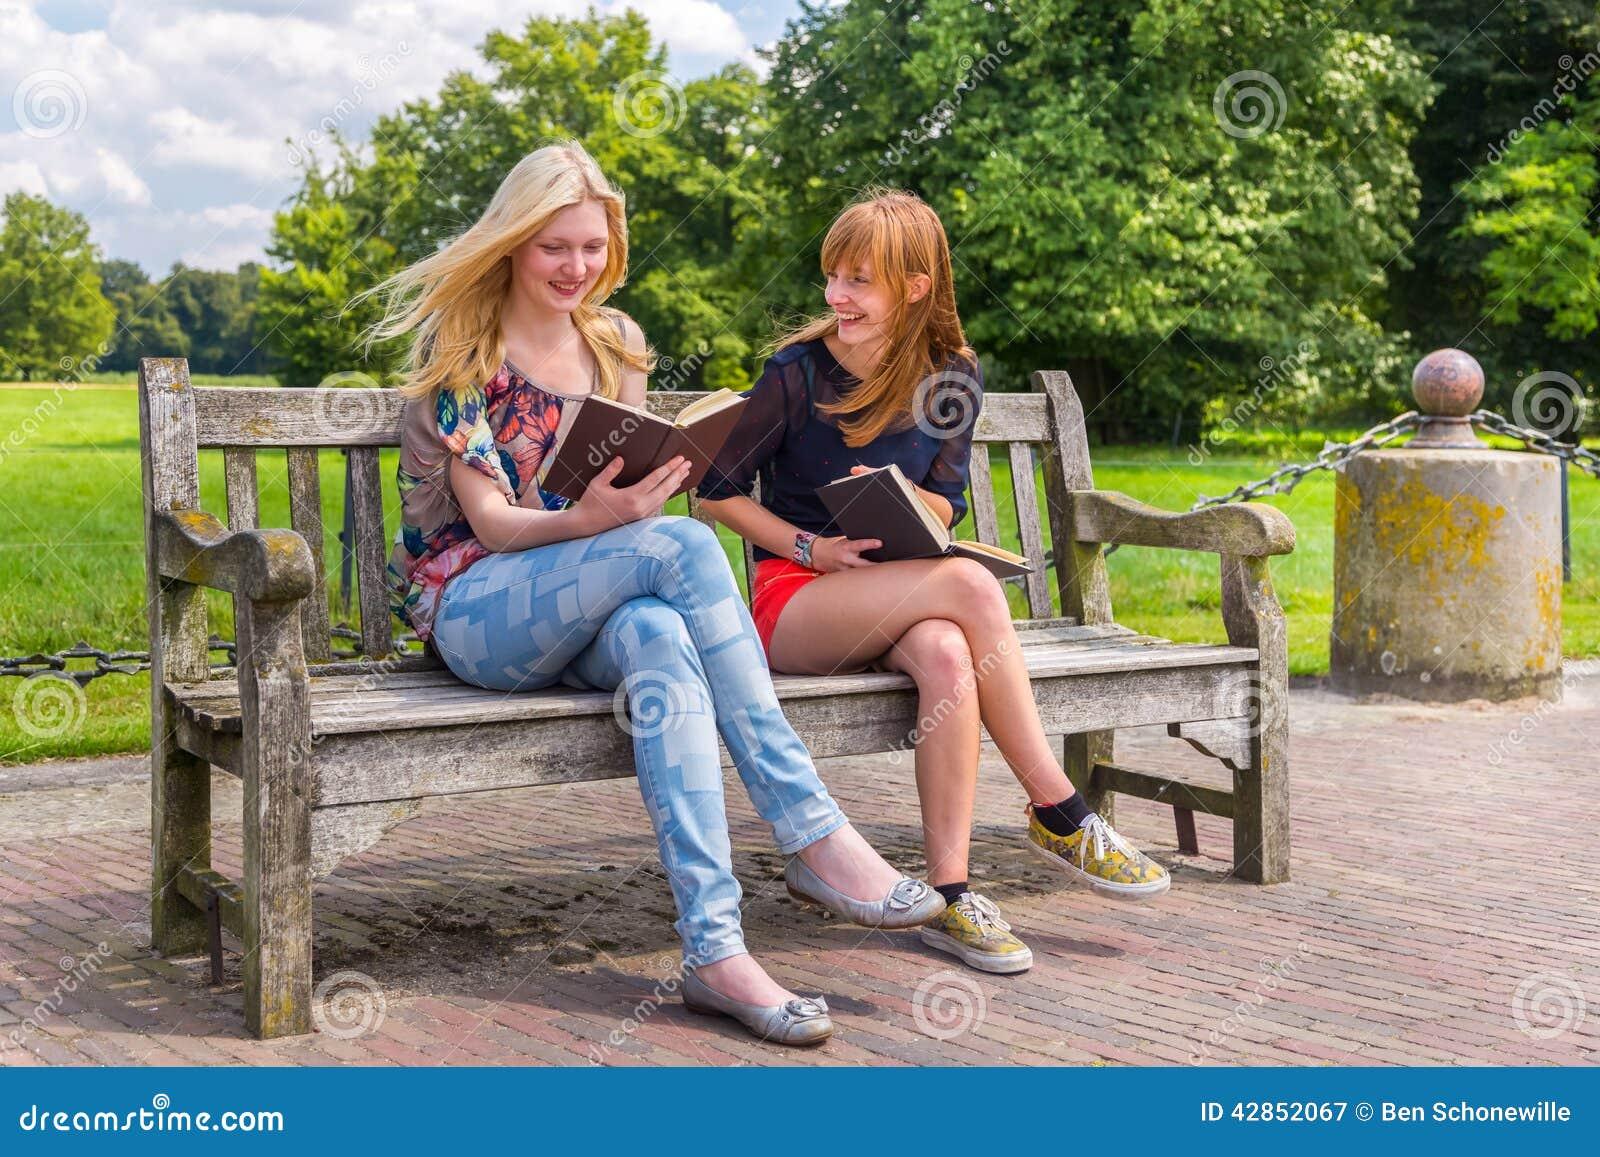 book biomathematical evidence of paternity biomathematischer